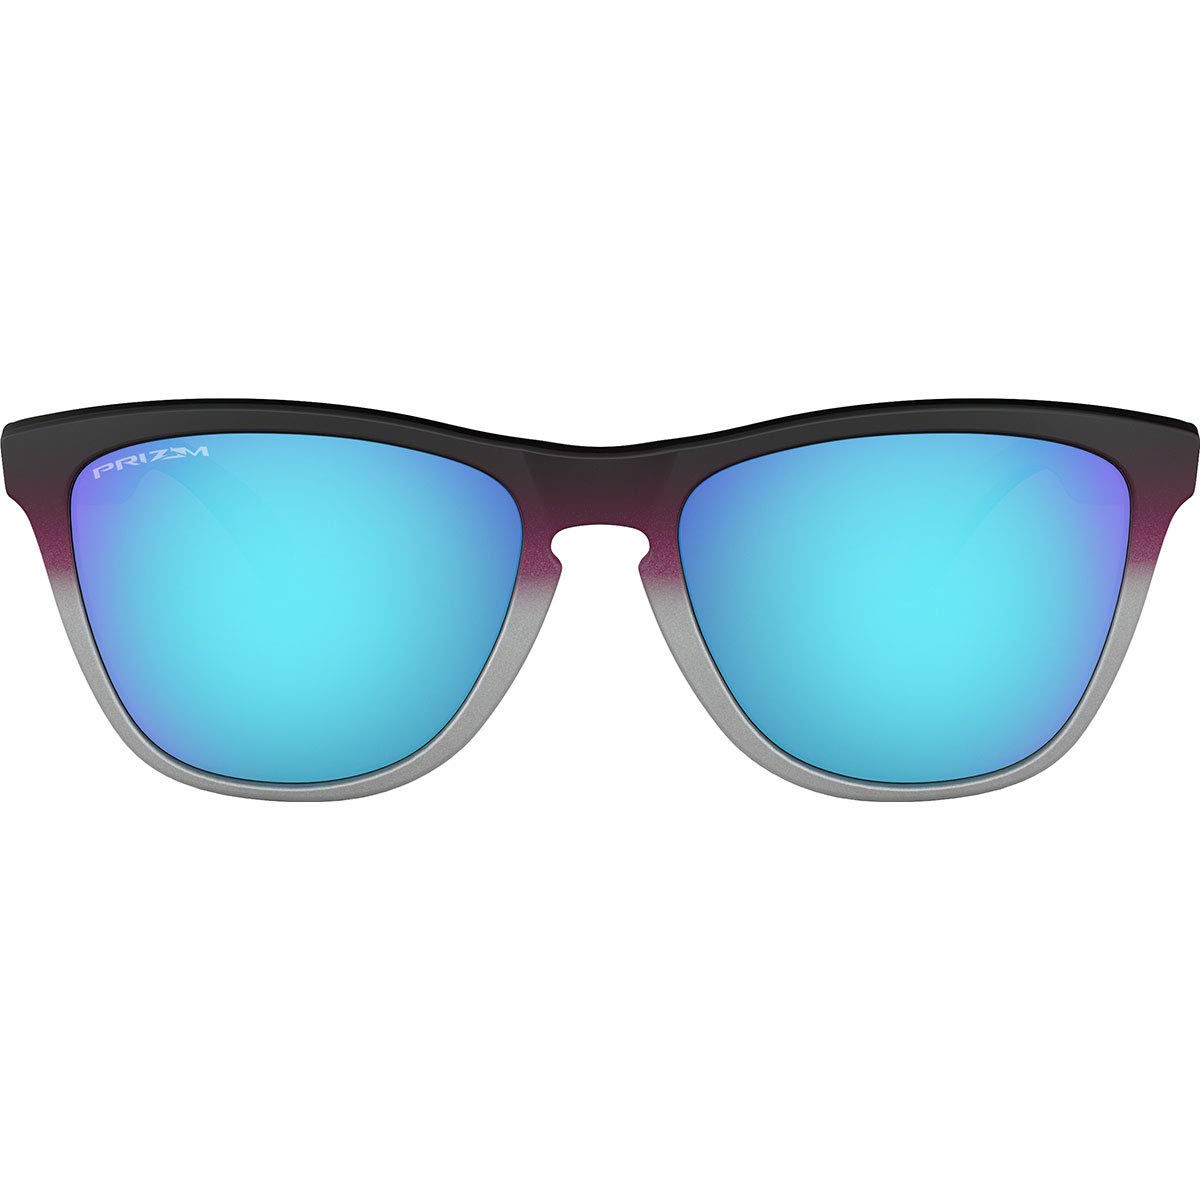 76486d369 Amazon.com: Oakley Men's Frogskins Non-Polarized Iridium Square Sunglasses,  Black, 54.7 mm: Clothing